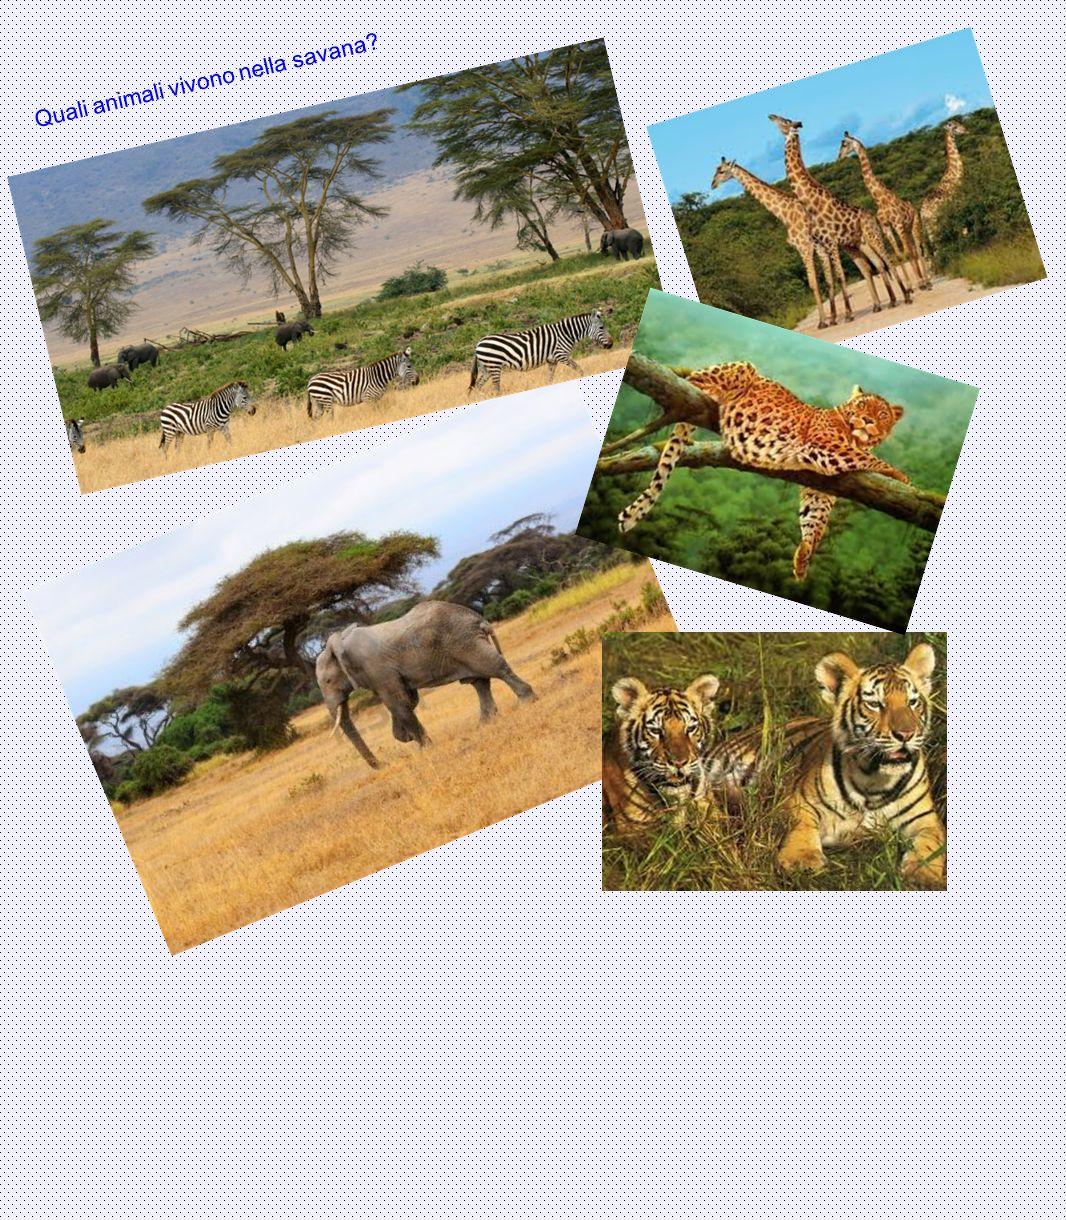 Quali animali vivono nella savana?